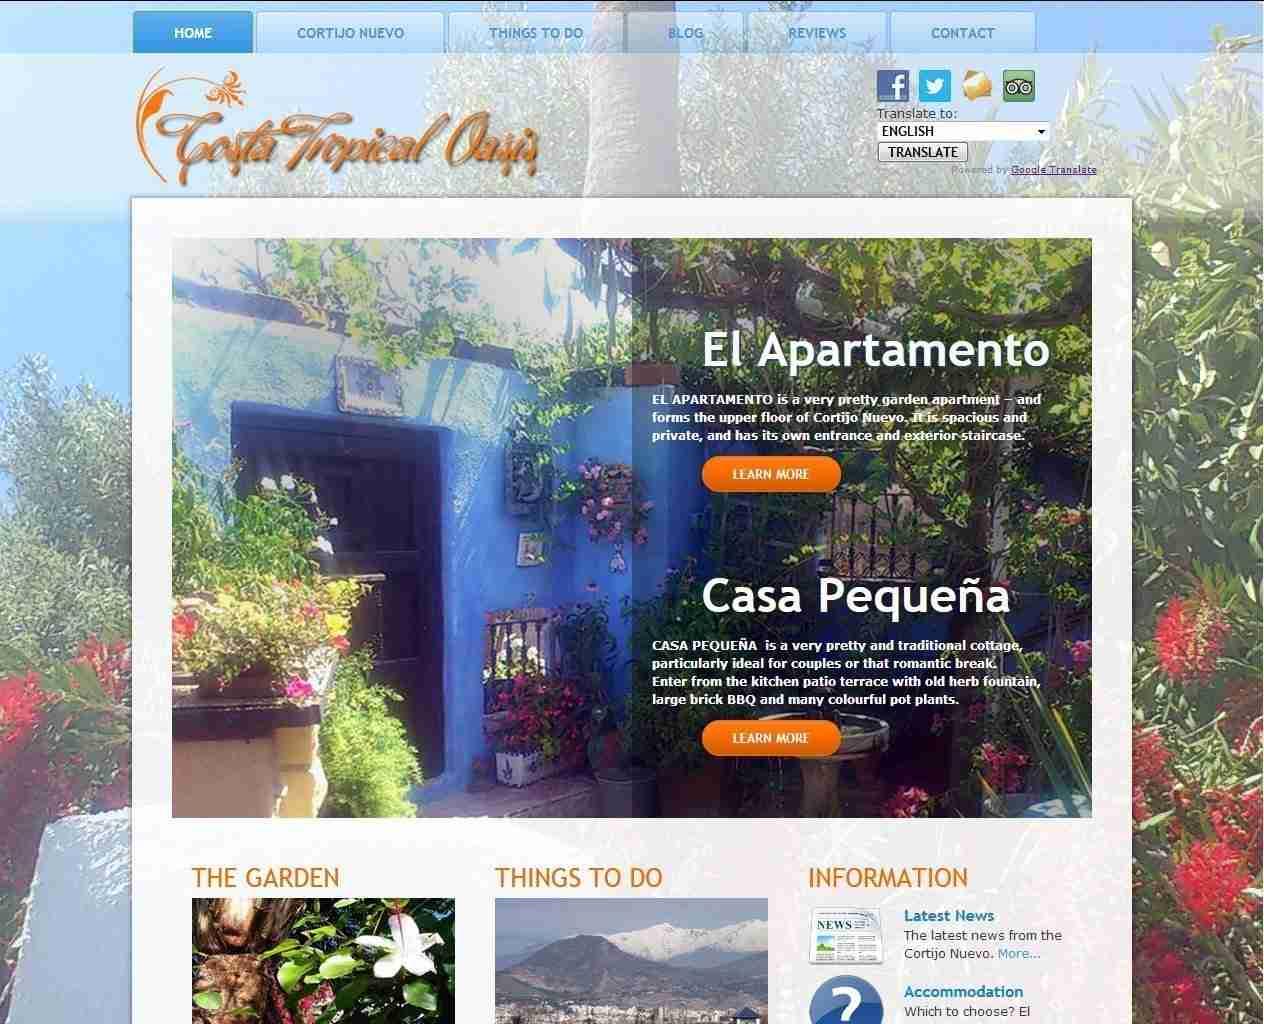 Spain Web Design and more by Gandy-Draper | Gandy-Draper deserve their many testimonials.